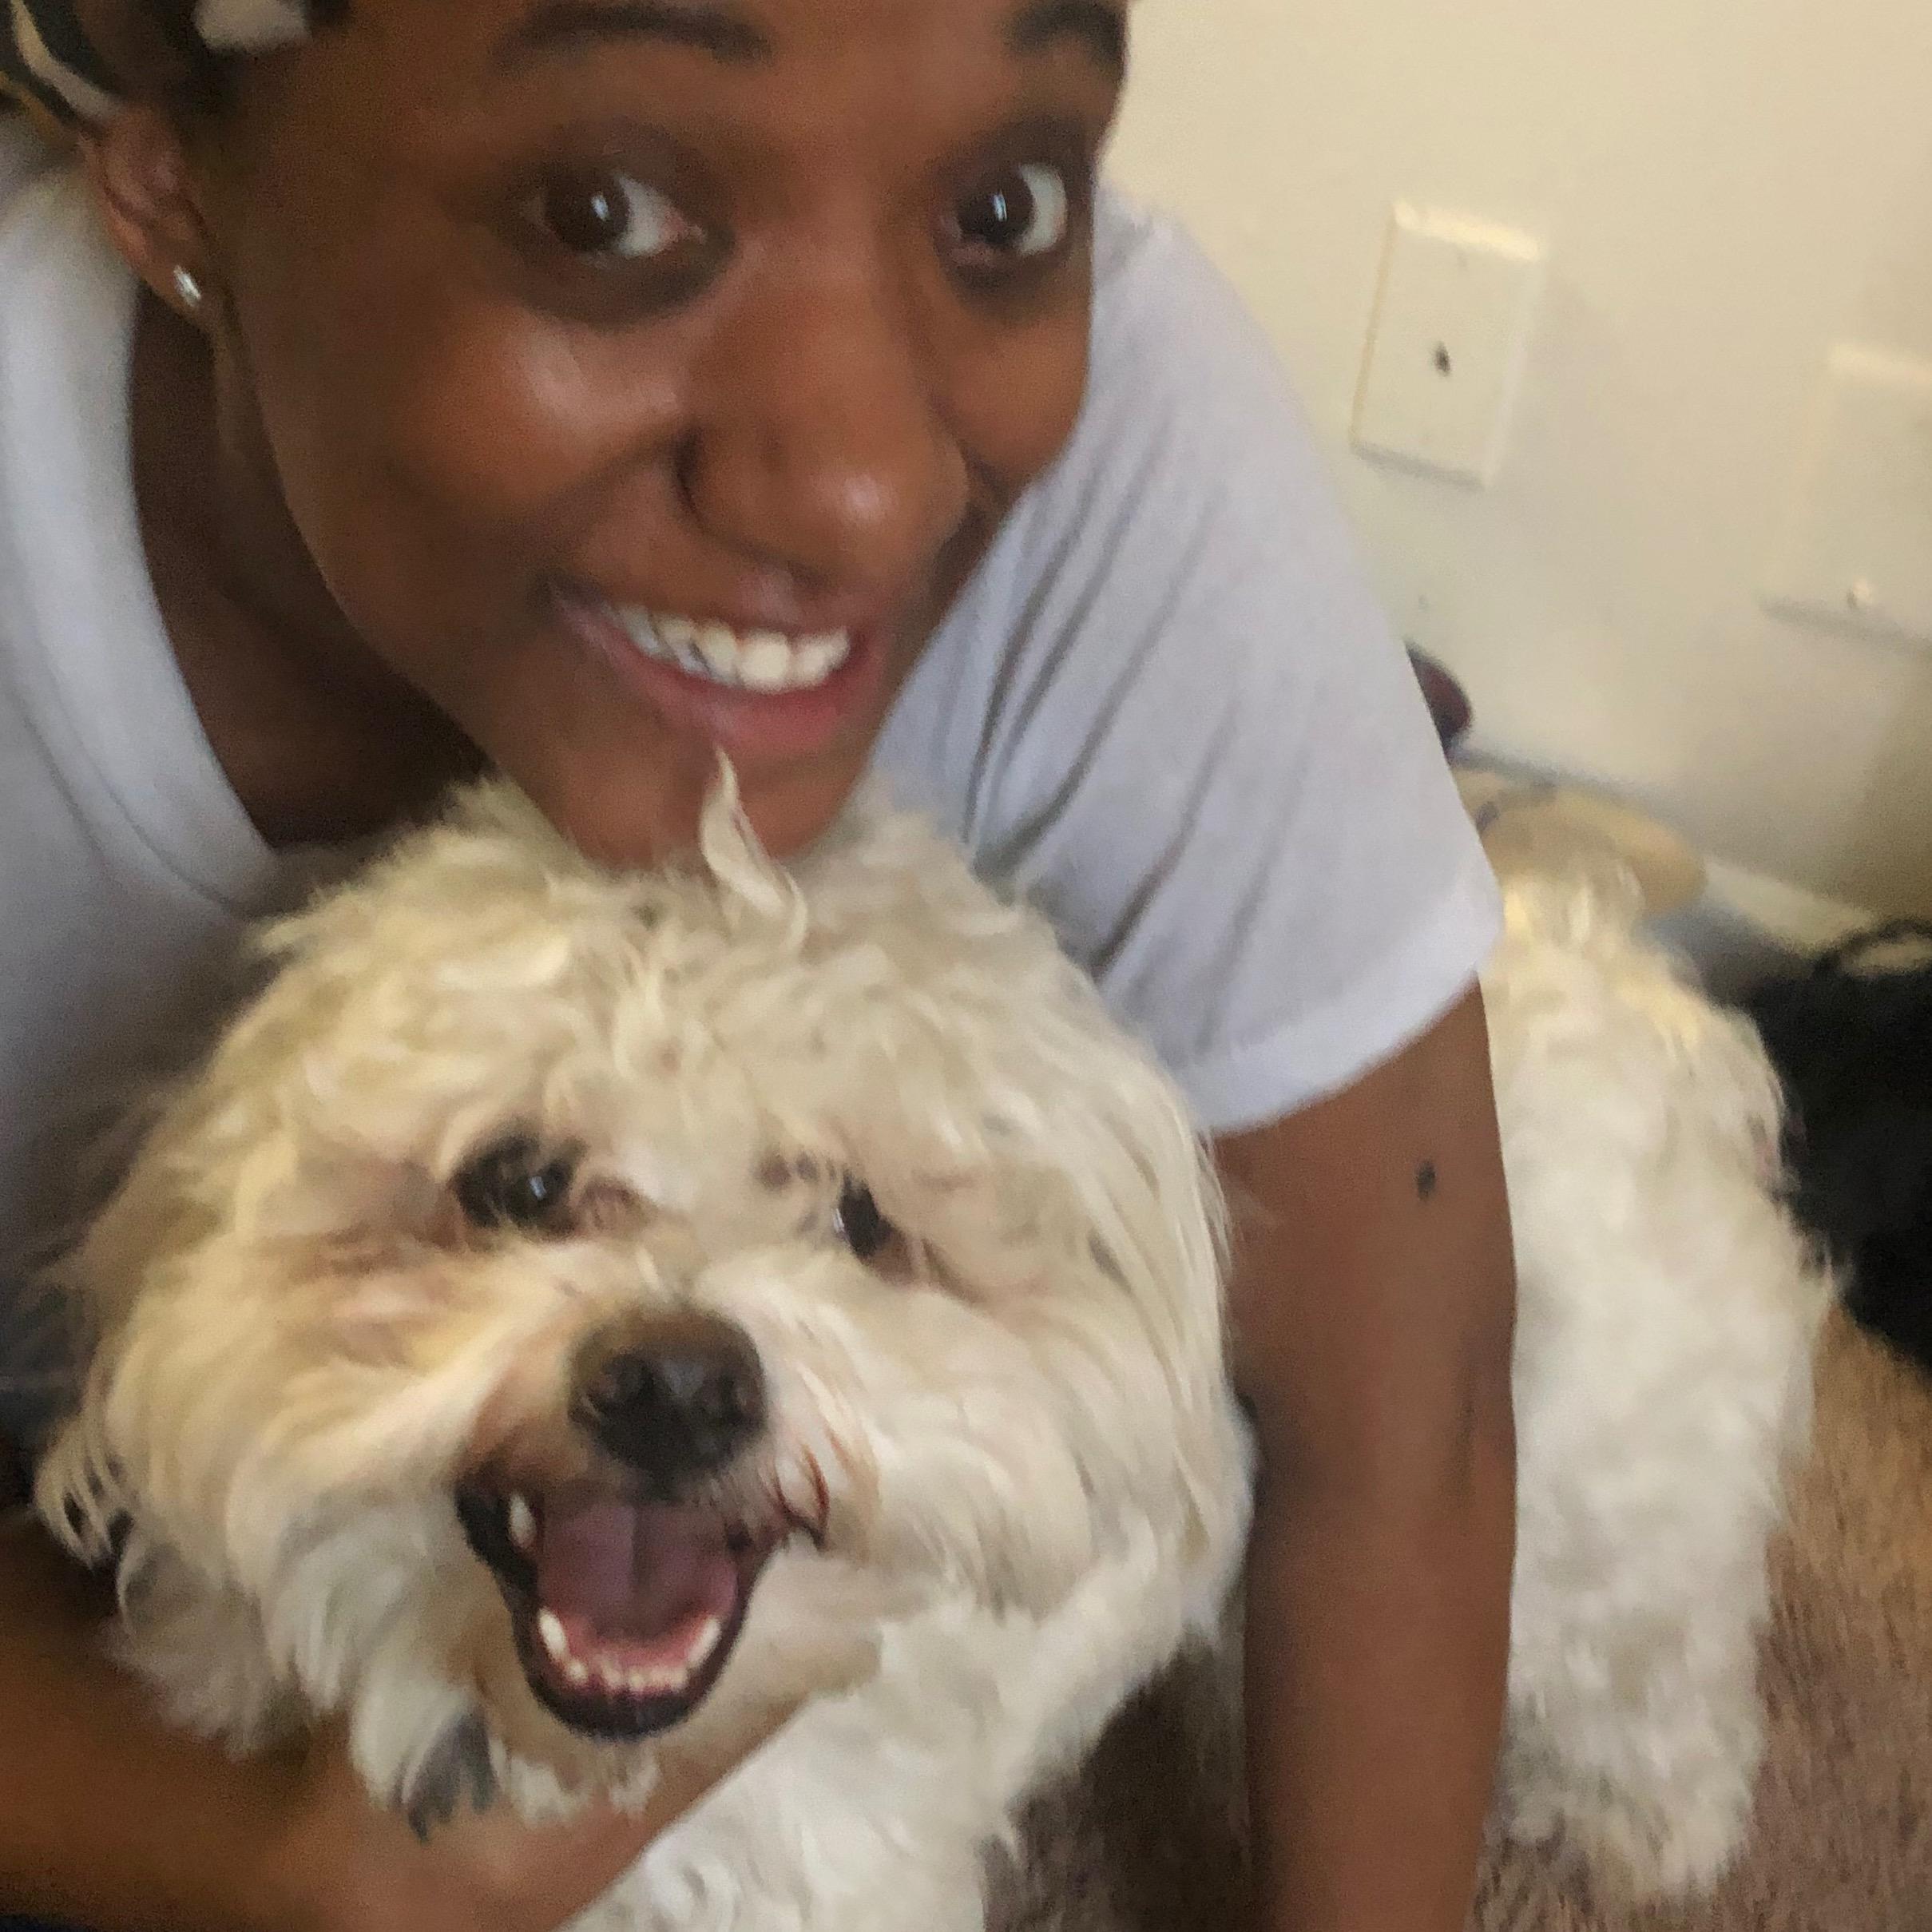 Ebony's dog day care